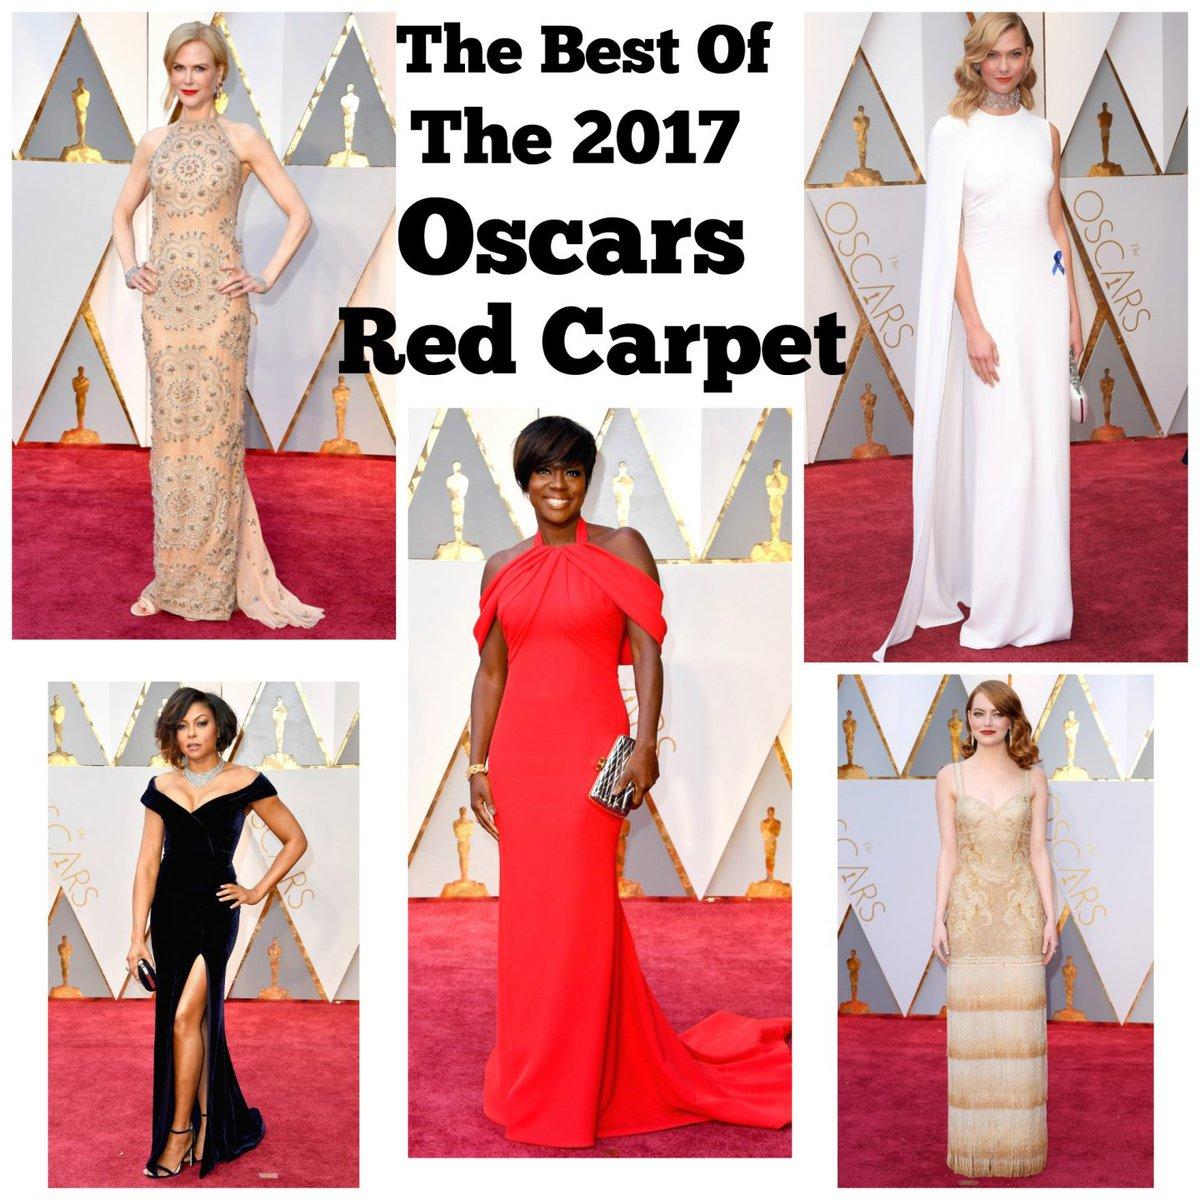 best of oscars 2017 red carpet